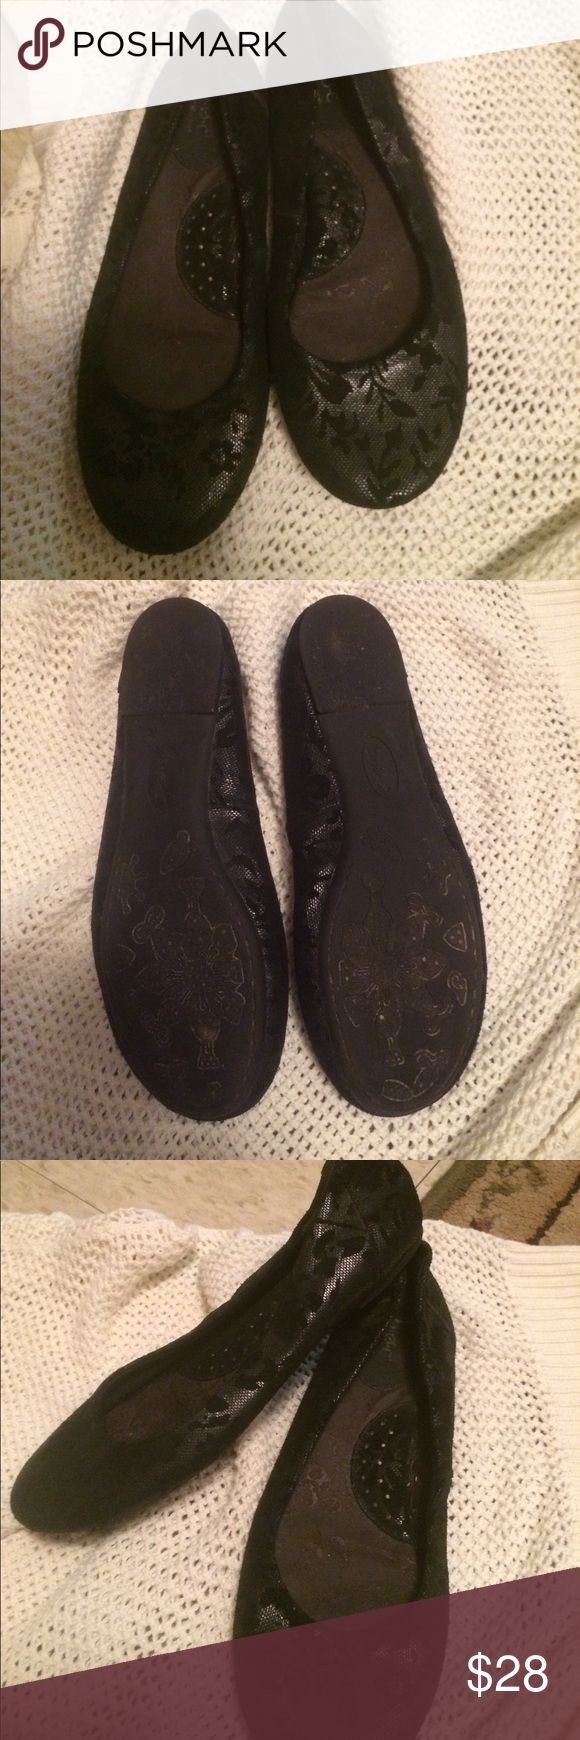 BOC Black floral ballet/flat. BOC beautiful black floral print flat/ballet shoe size 8 Born Shoes Flats & Loafers